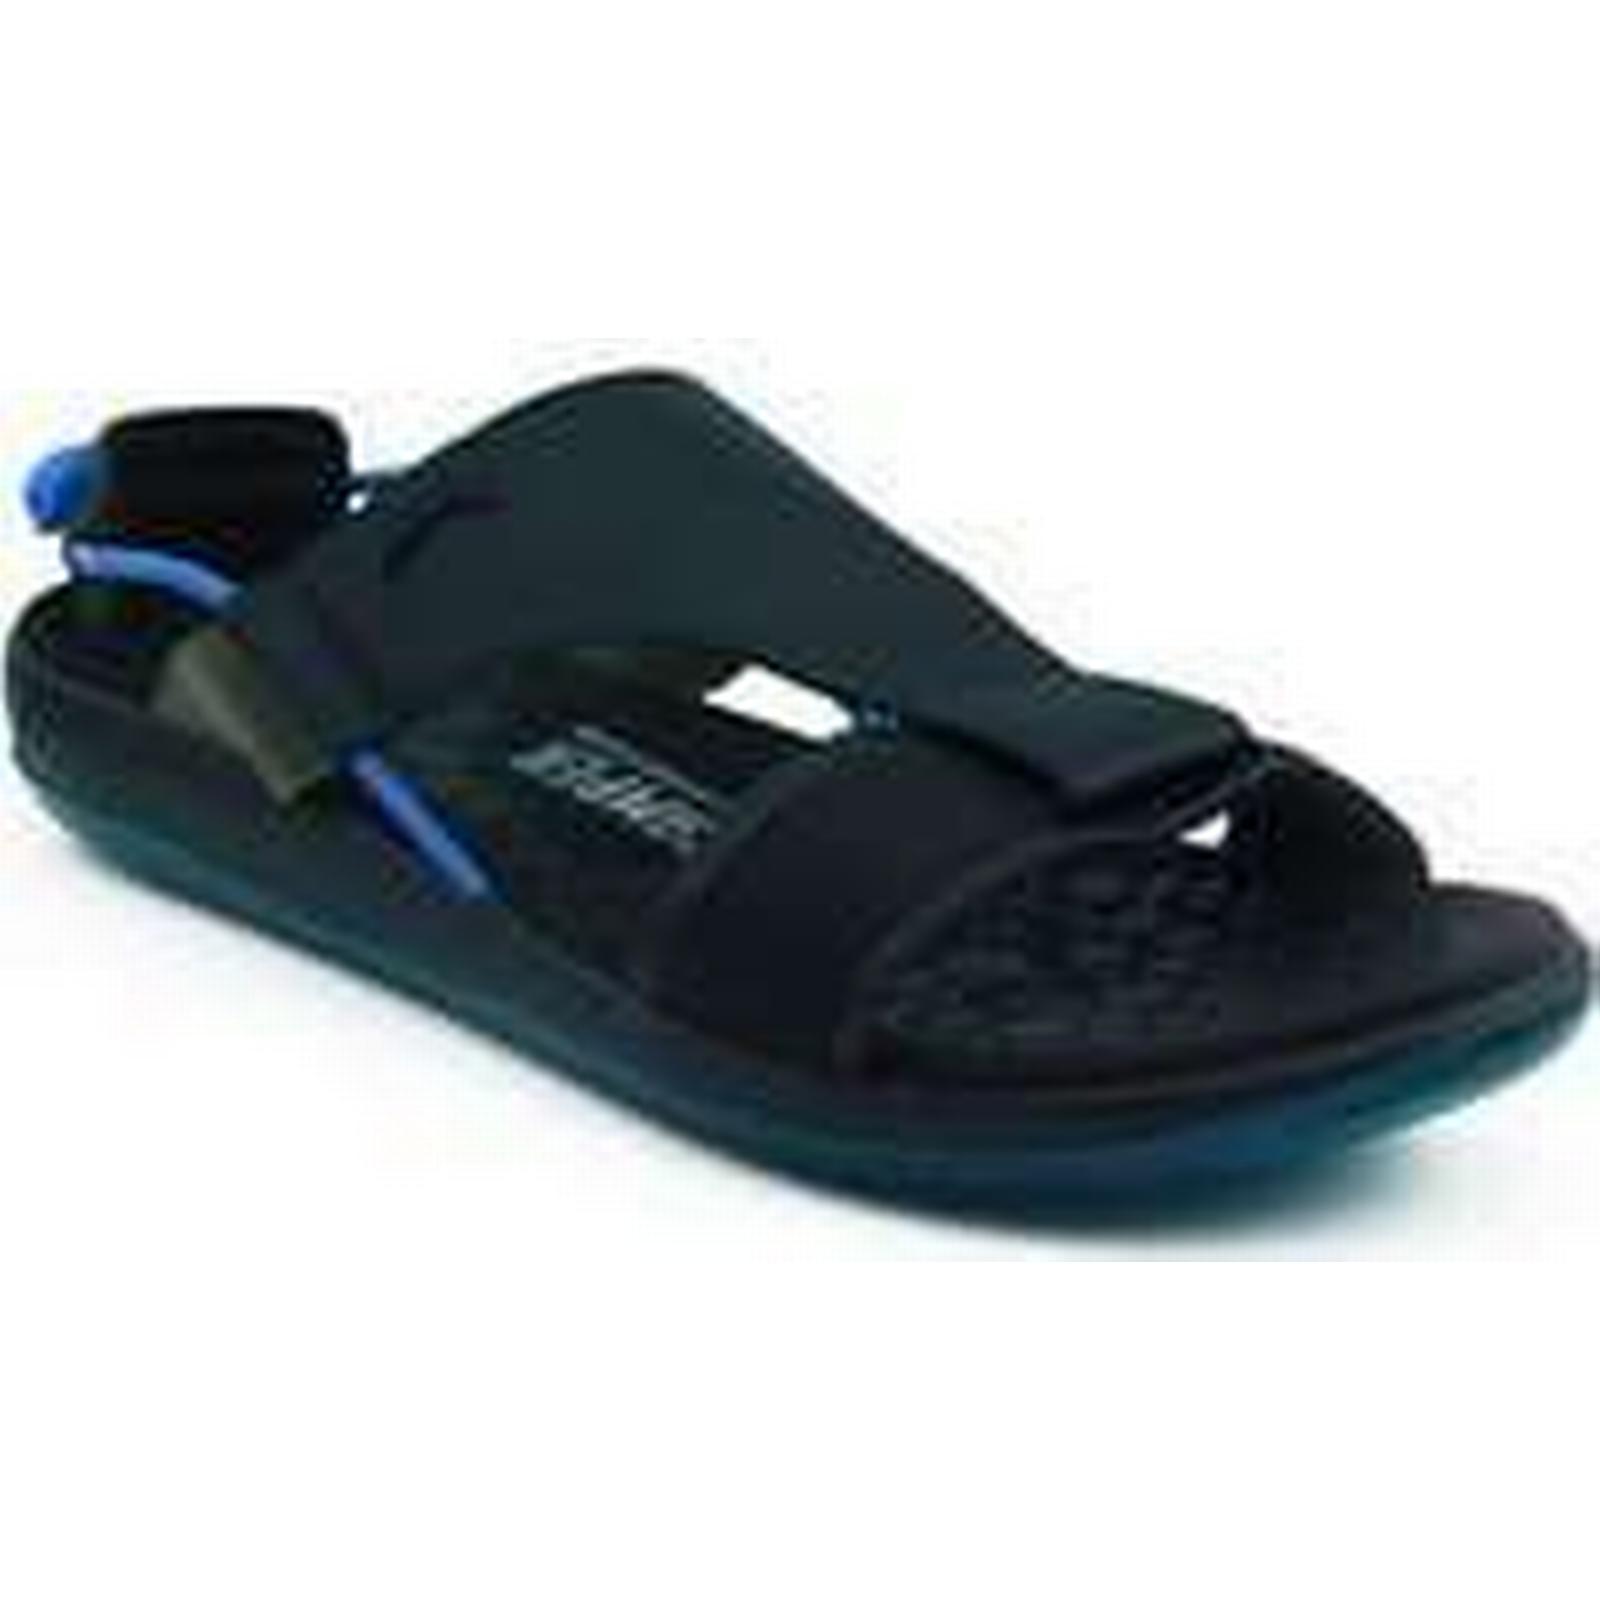 Spartoo.co.uk Camper JEDI Shoes women's Outdoor Shoes JEDI in Black 783905